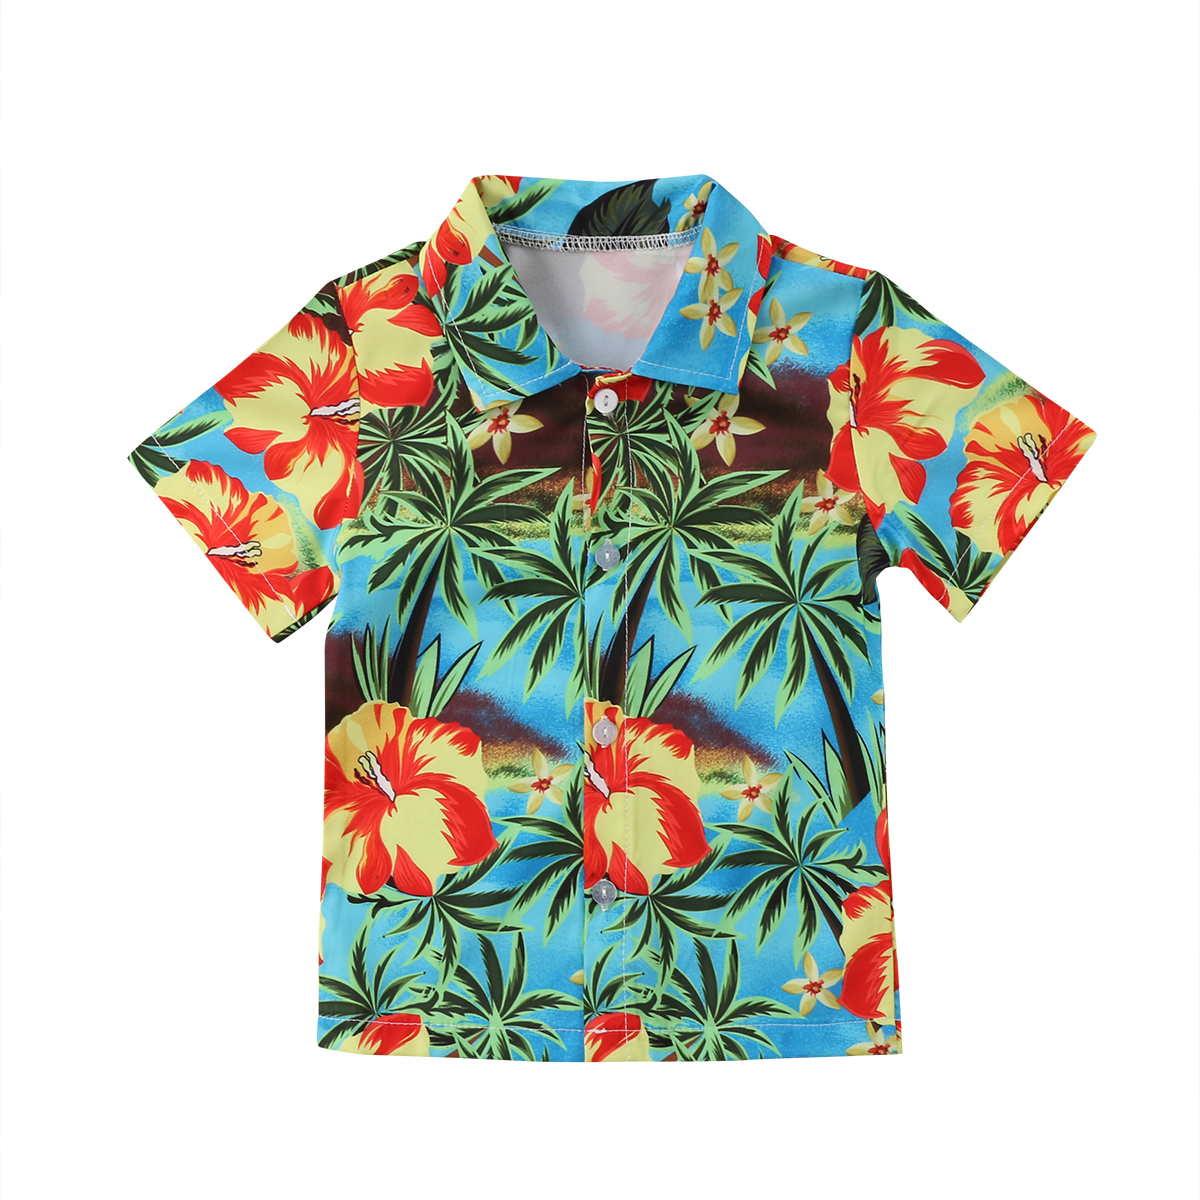 7ade4ee8e6 Brand shirt Hawaiian shirt kids Baby boy shirt Baby blouse Kids school  clothes 2-8 year Cotton Toddler summer shirts Short short